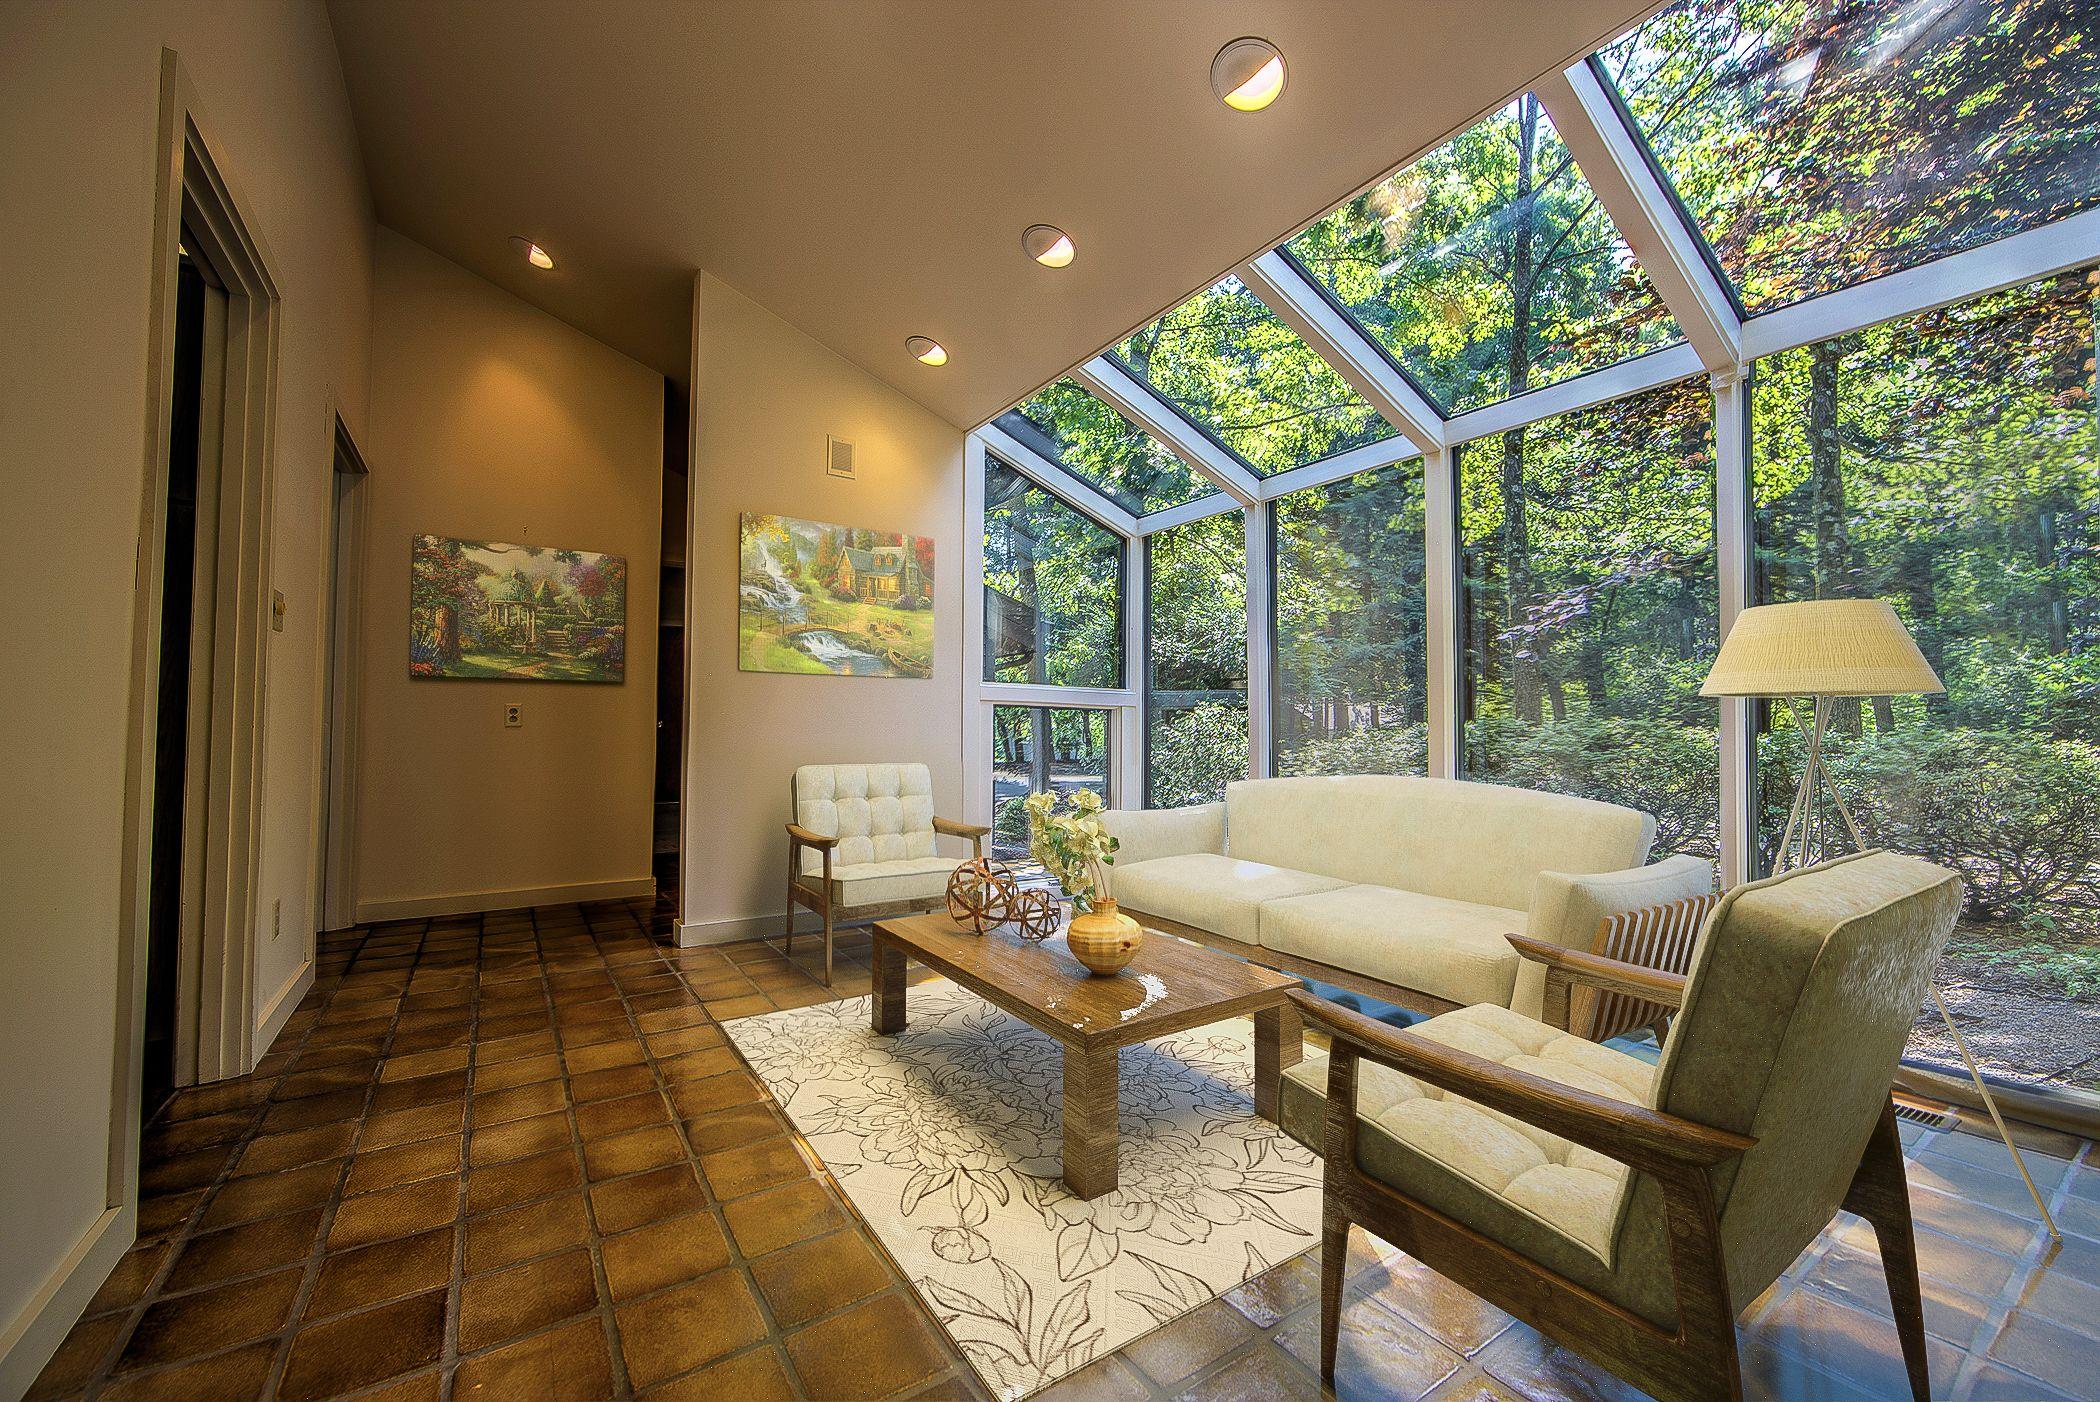 Rustic - Contemporary Sunroom